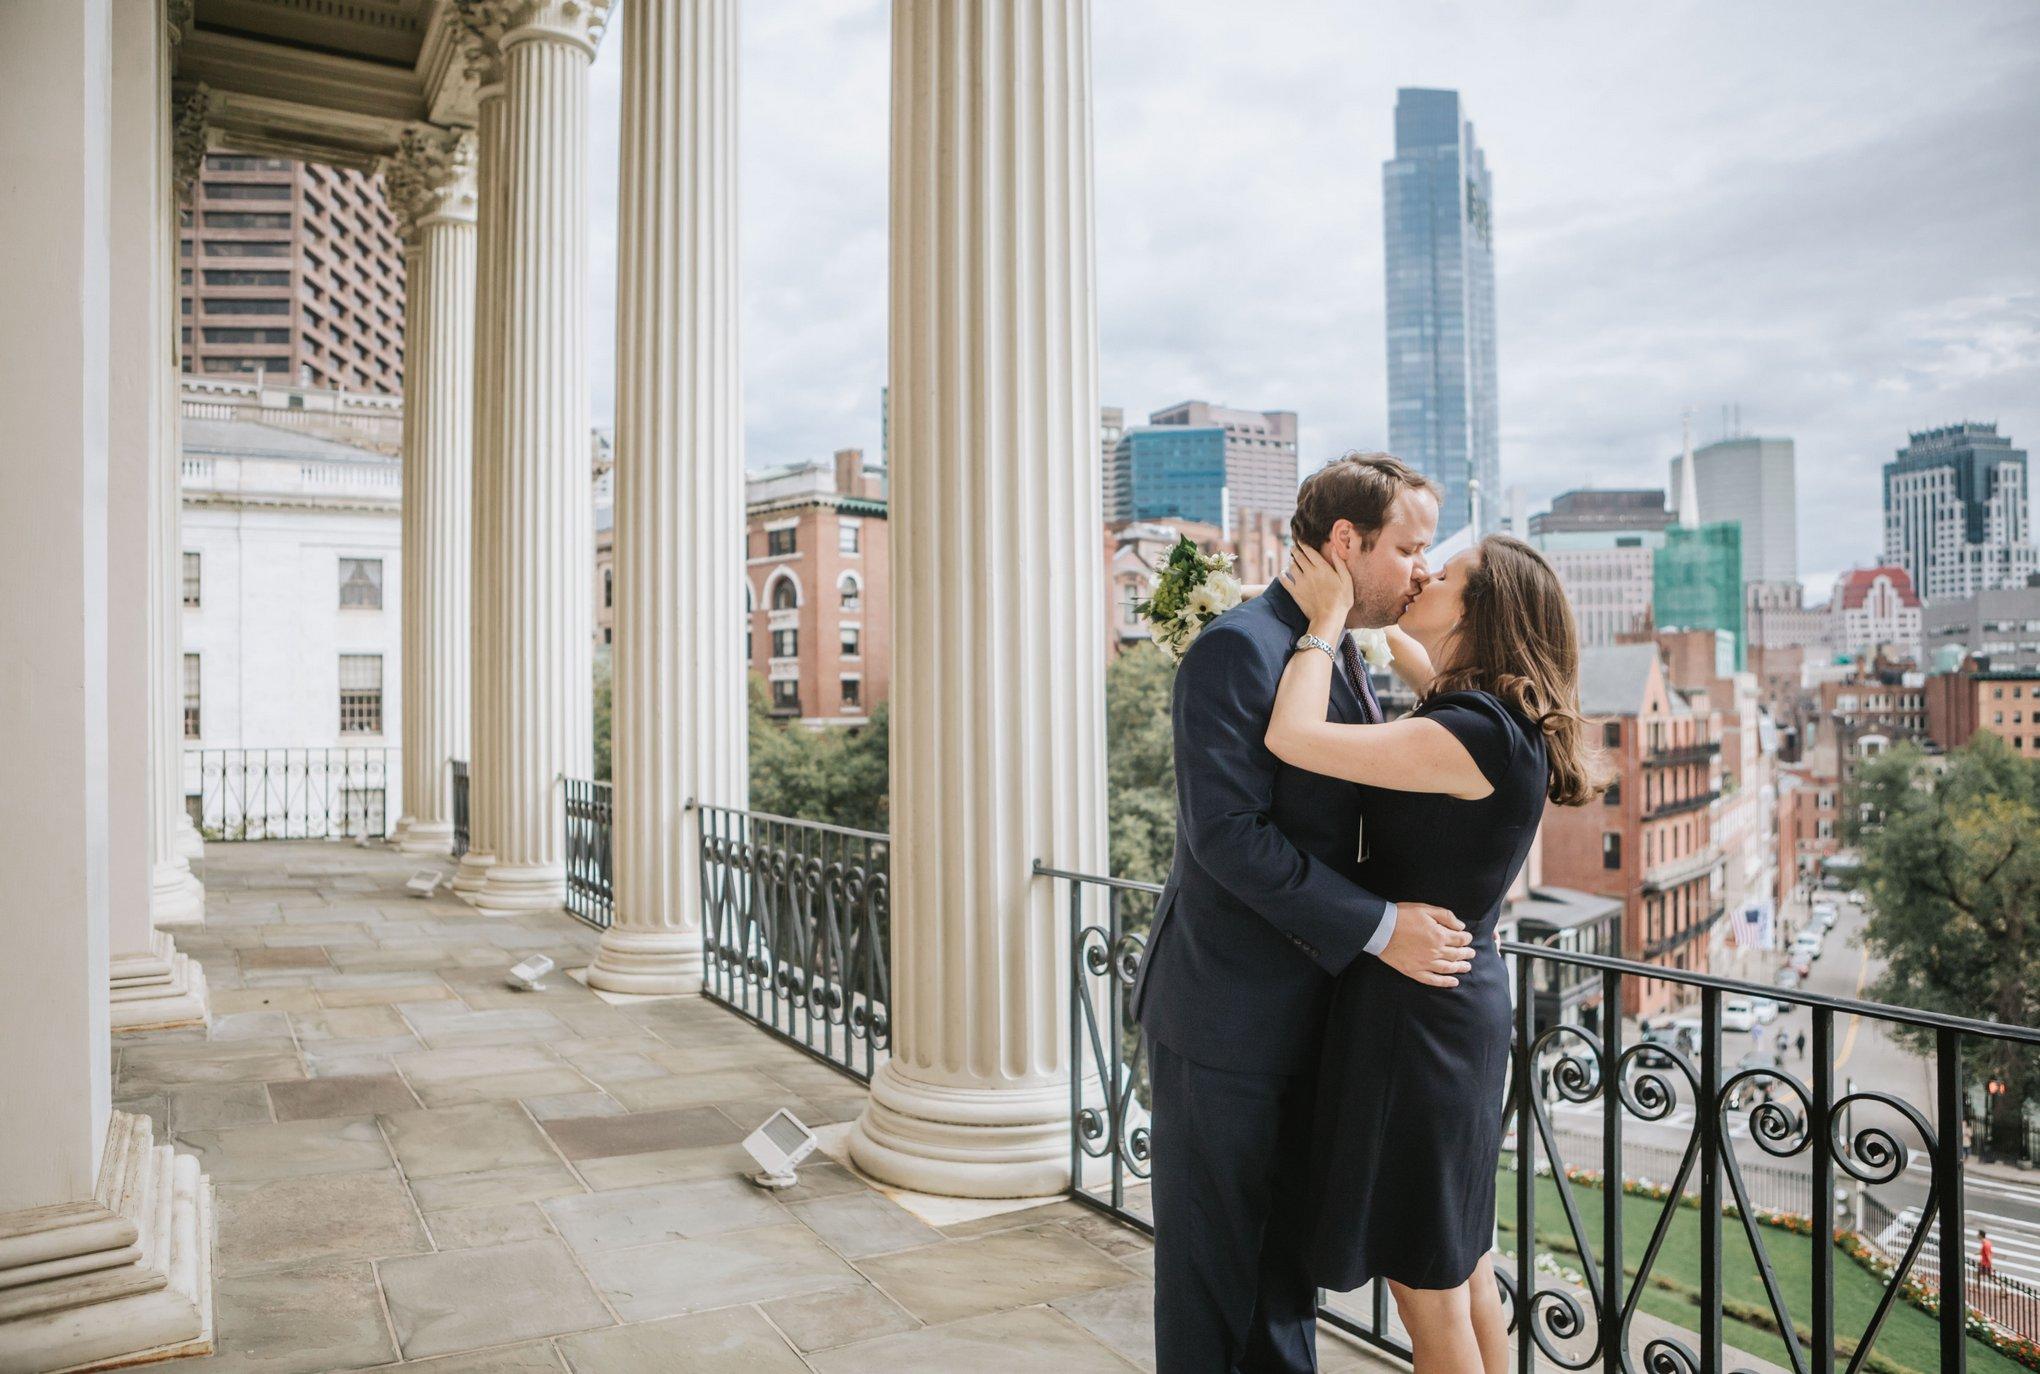 Lena_Mirisola_State_House_Wedding_Nancy_Bruce-8.jpg